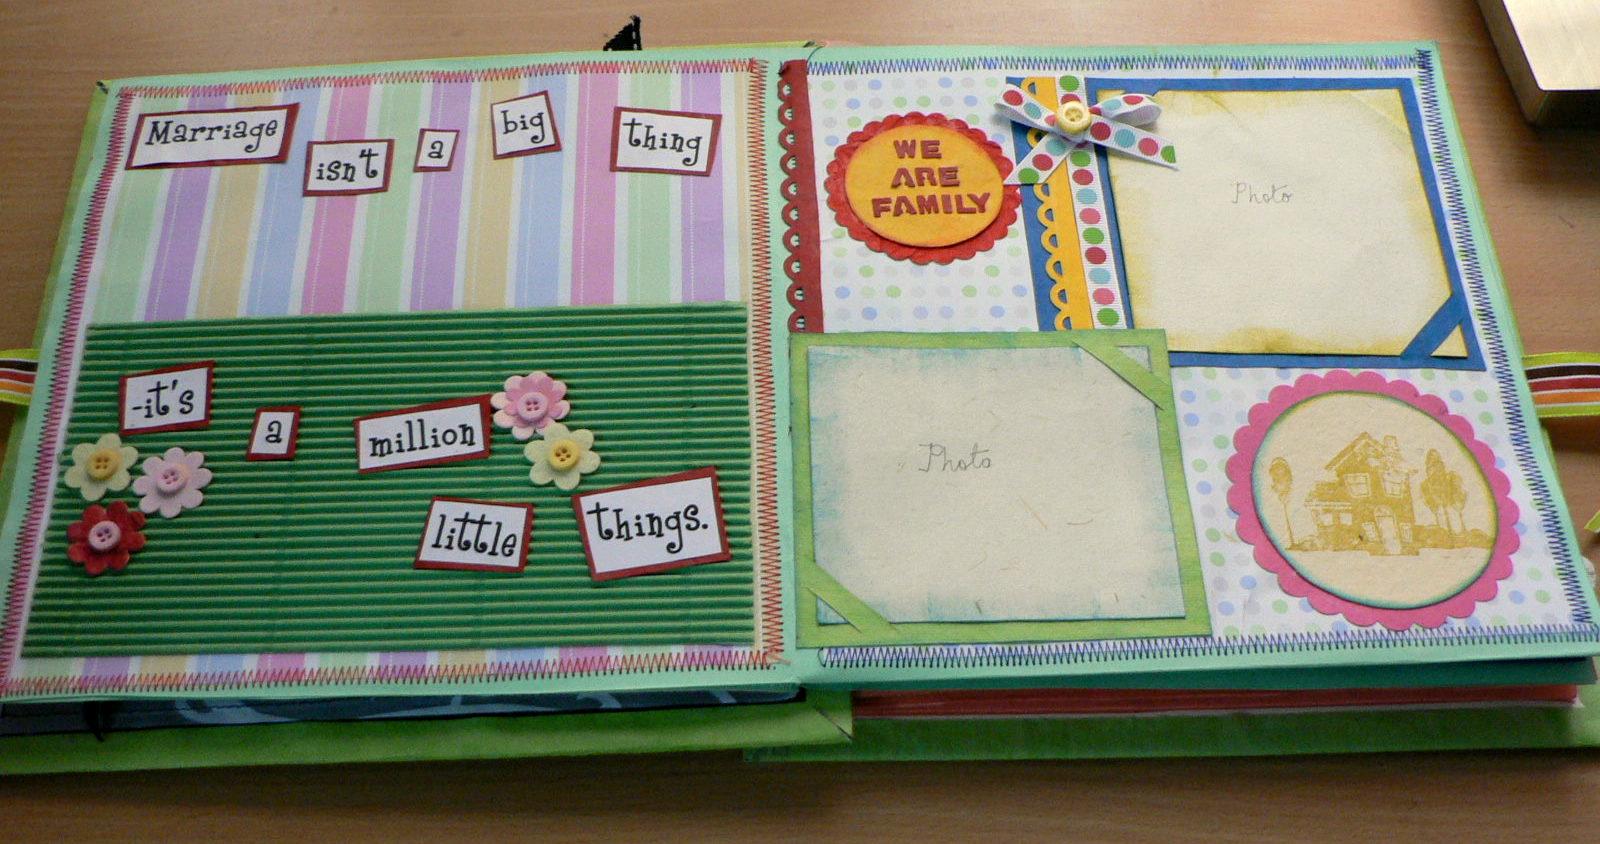 Juhi S Handmade Cards Multiple Page Card